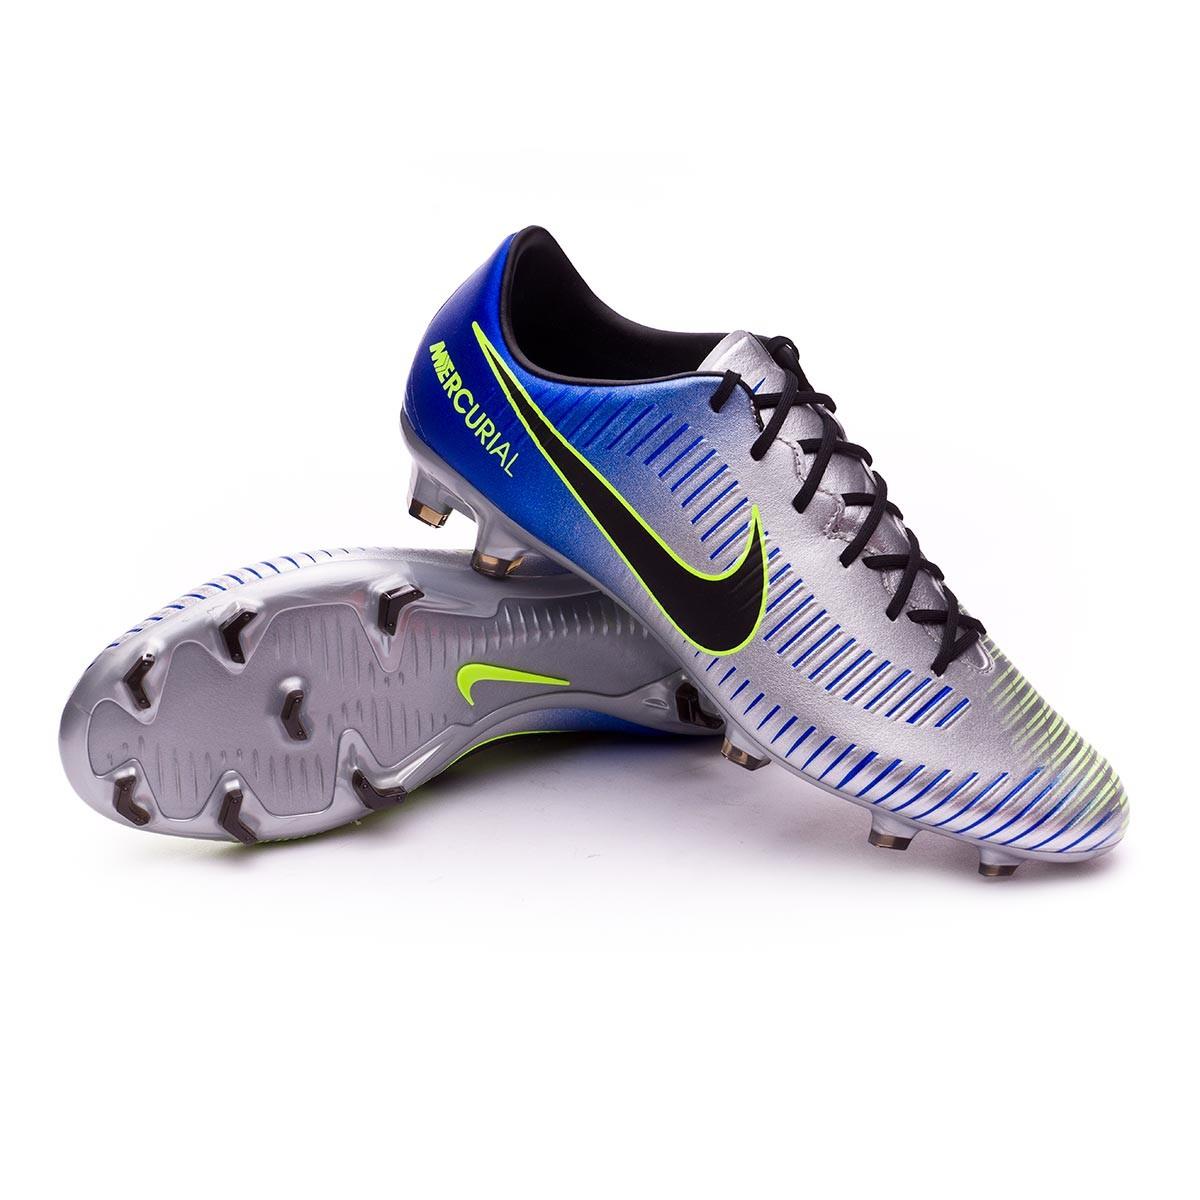 3d6e069c4b0b Football Boots Nike Mercurial Veloce III FG Neymar Racer blue-Black ...